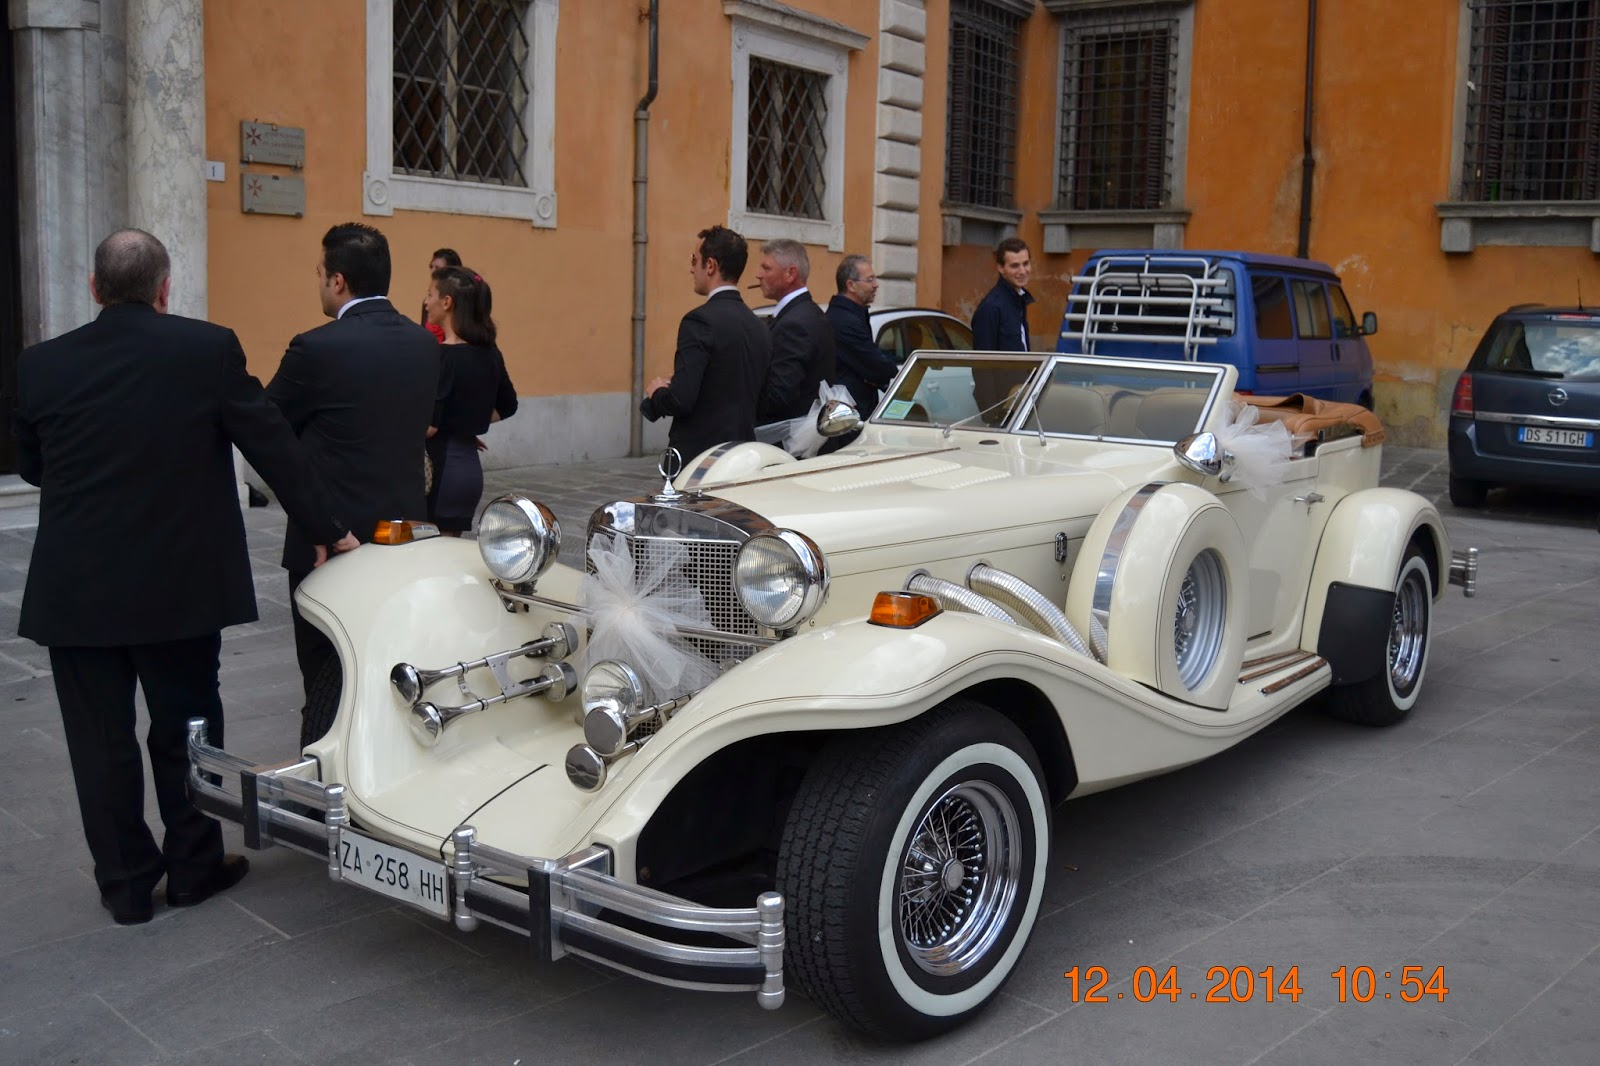 Marriage @ Pisa